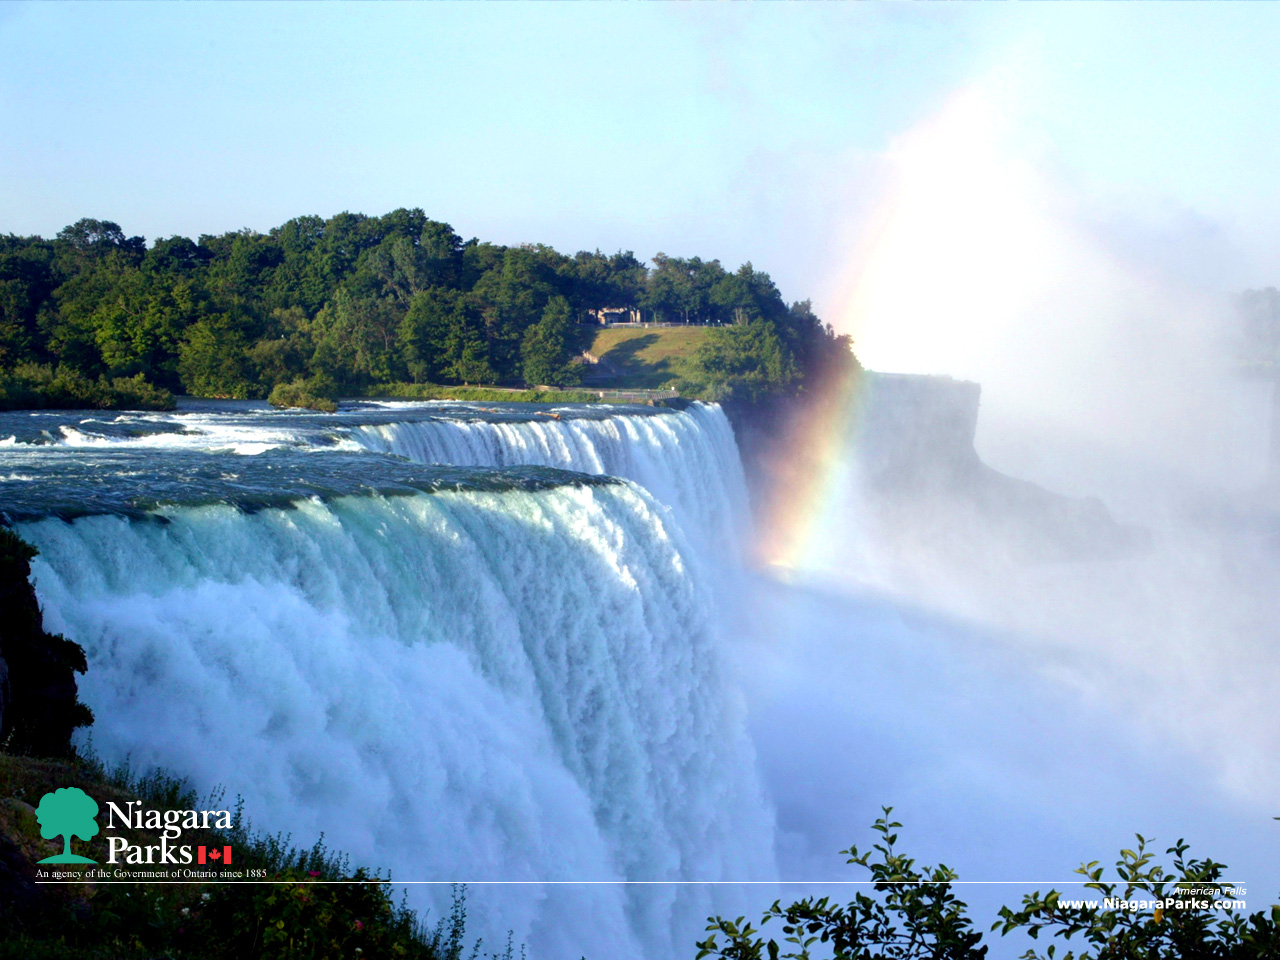 Niagara Falls HD Wallpapers HD Wallpapers 360 1280x960